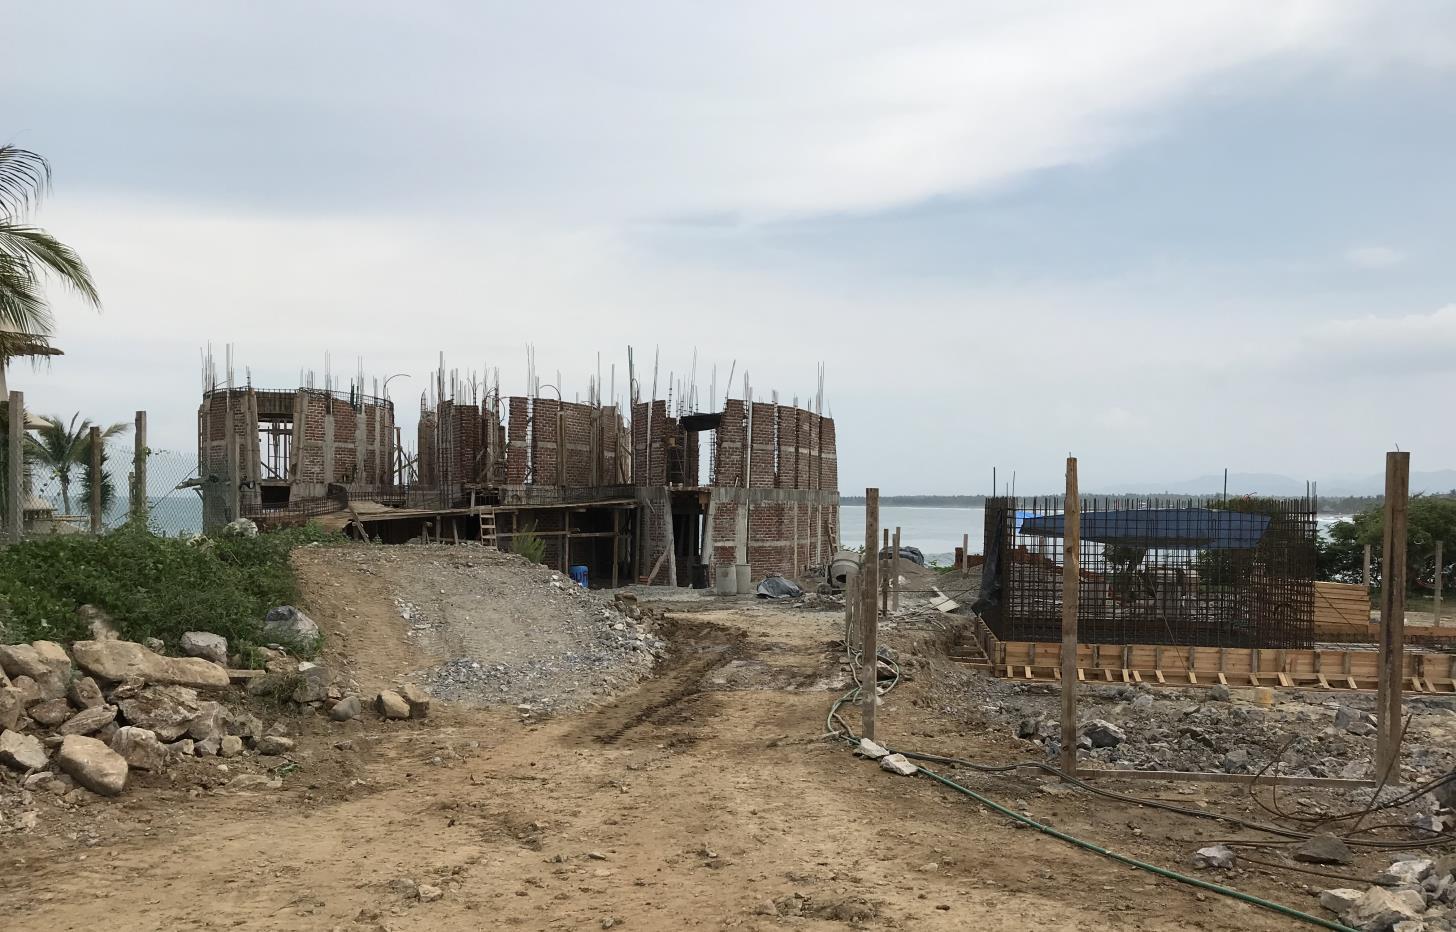 REPORTE-FOTOGRAFICO-PUNTA-MAJAHUA-18-DE-AGOSTO-DEL-2018-019.jpg